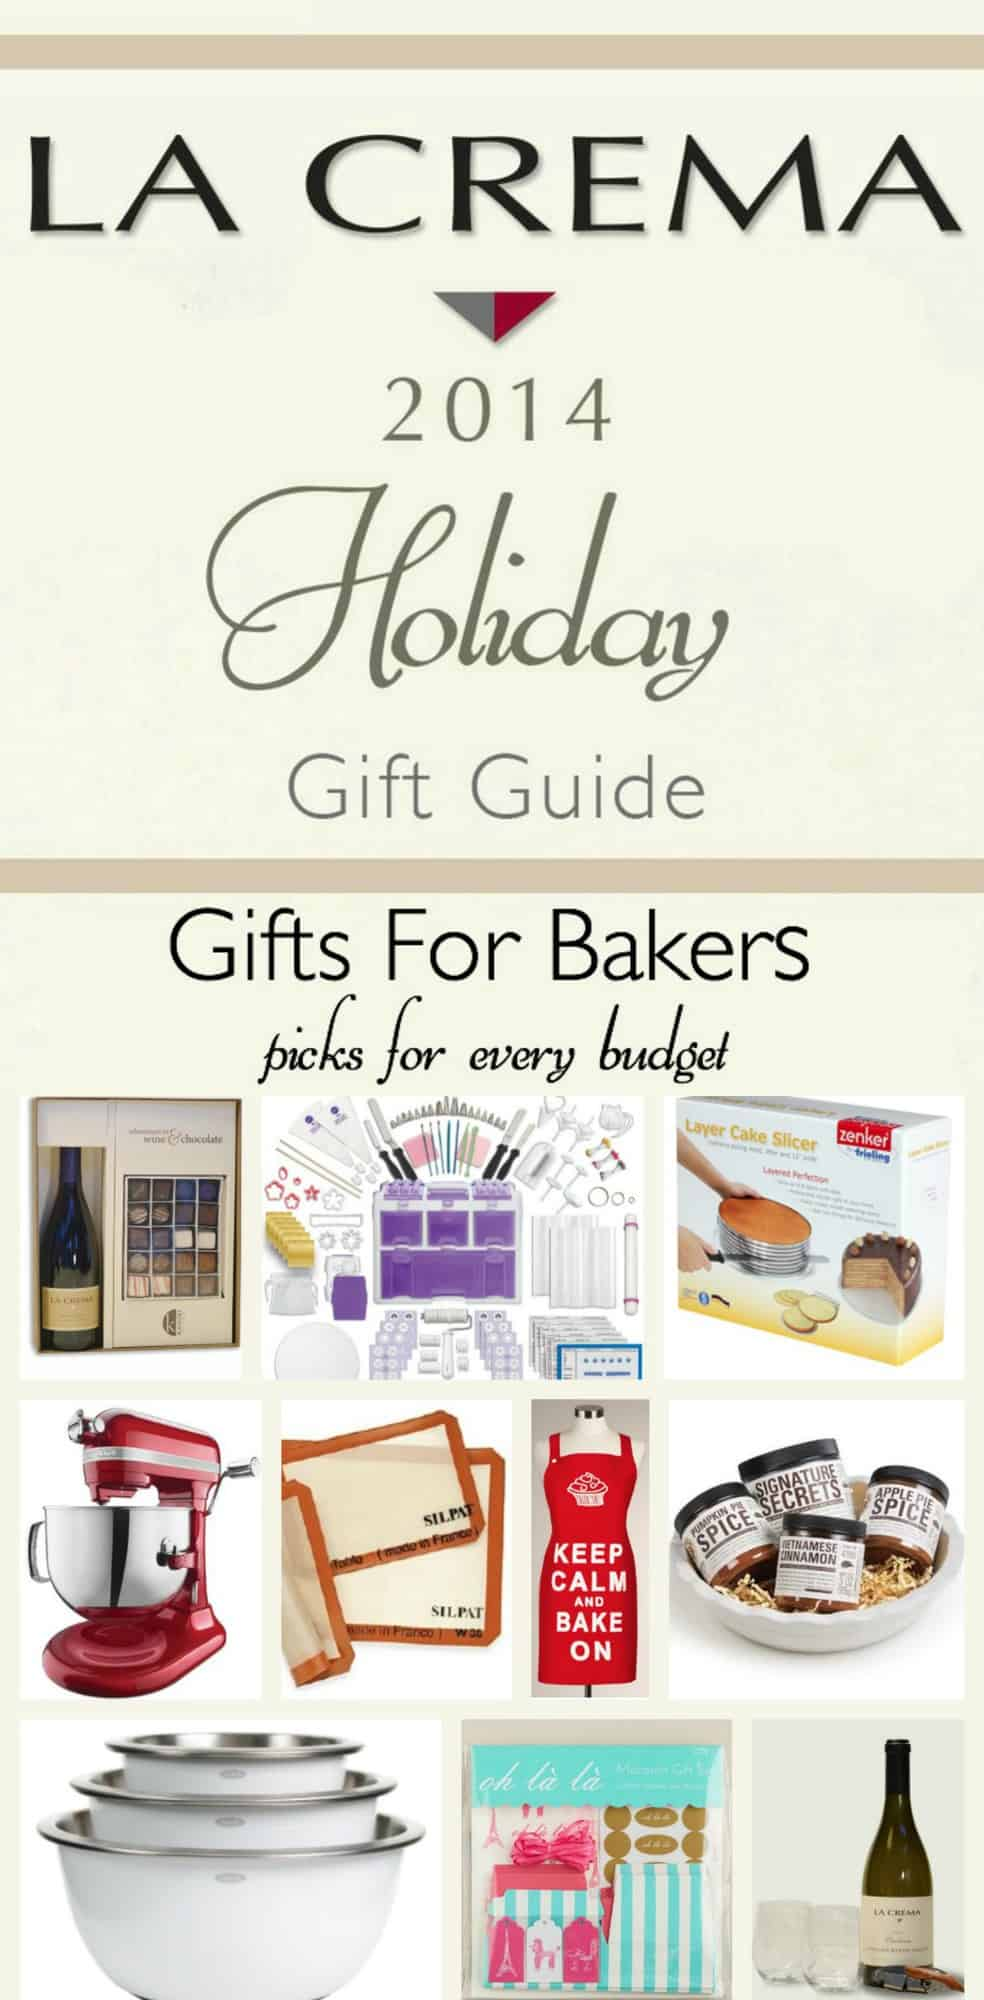 La Crema Holiday Gift Guide 2014 - Baking Guide